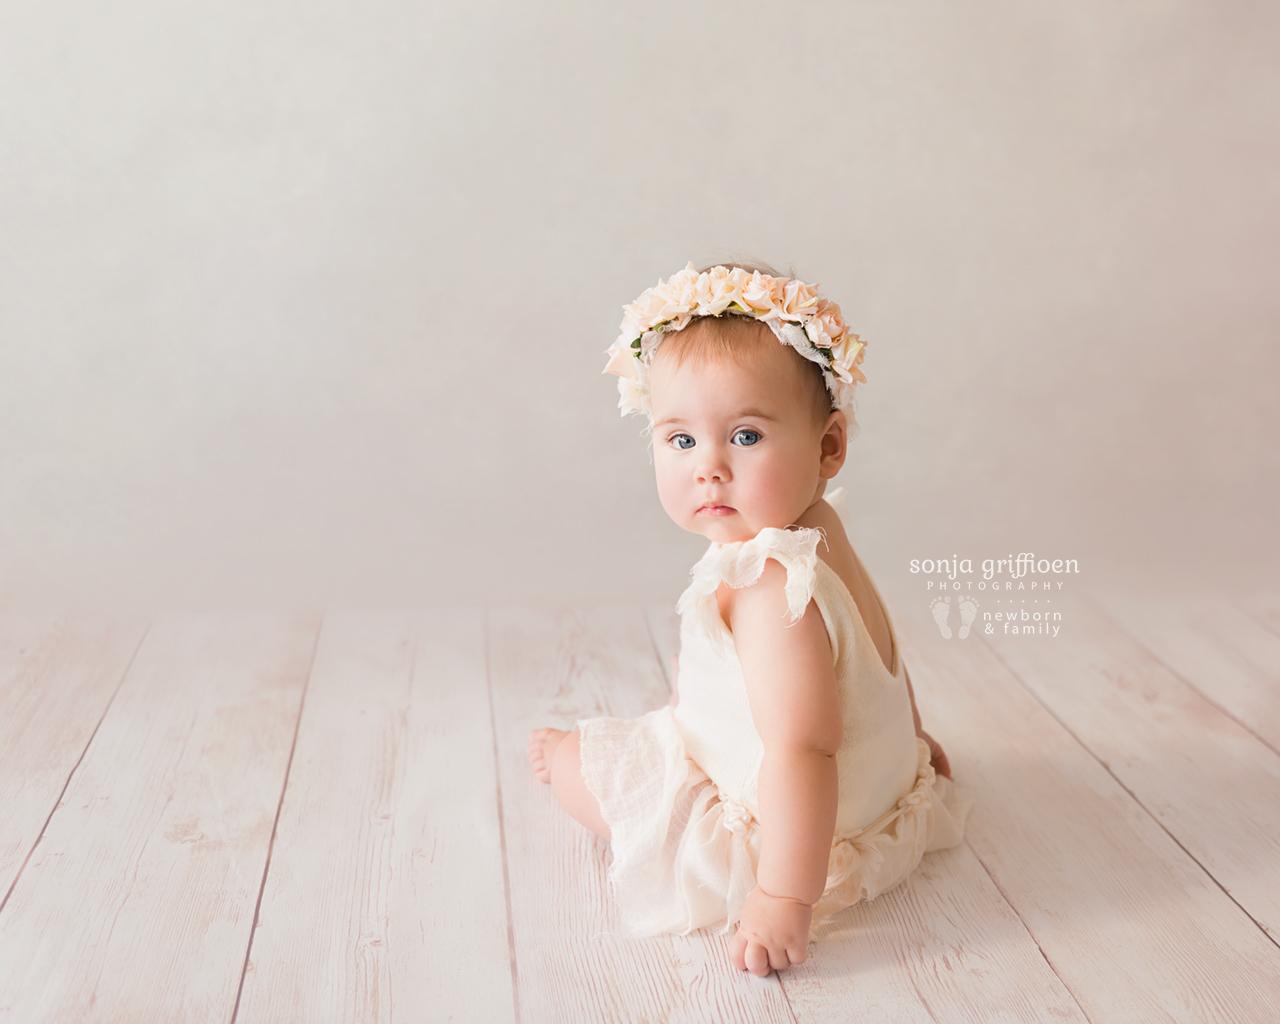 Thalia-Milestone-Brisbane-Newborn-Photographer-Sonja-Griffioen-03.jpg